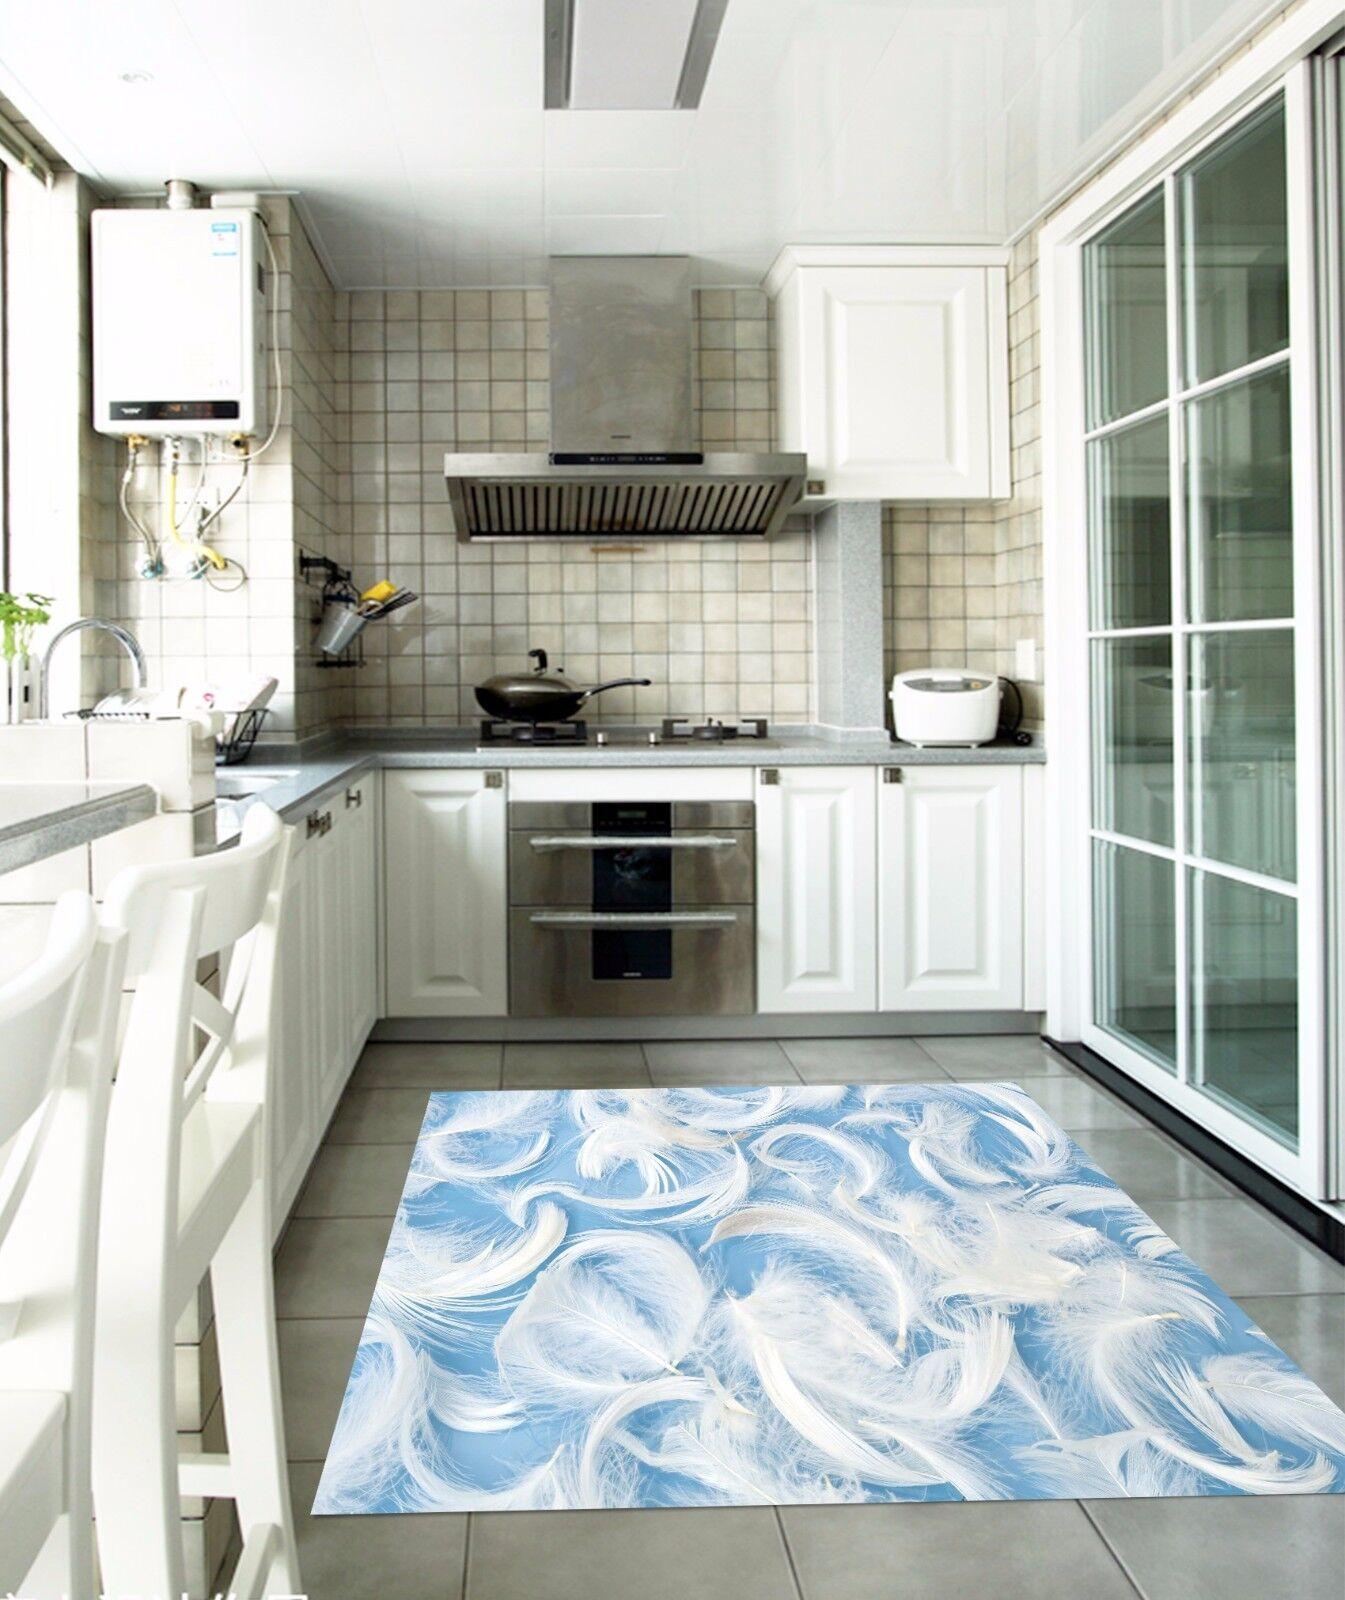 3D Feather 854 854 854 Kitchen Mat Floor Murals Wall Print Wall AJ WALLPAPER AU Carly 87e6be